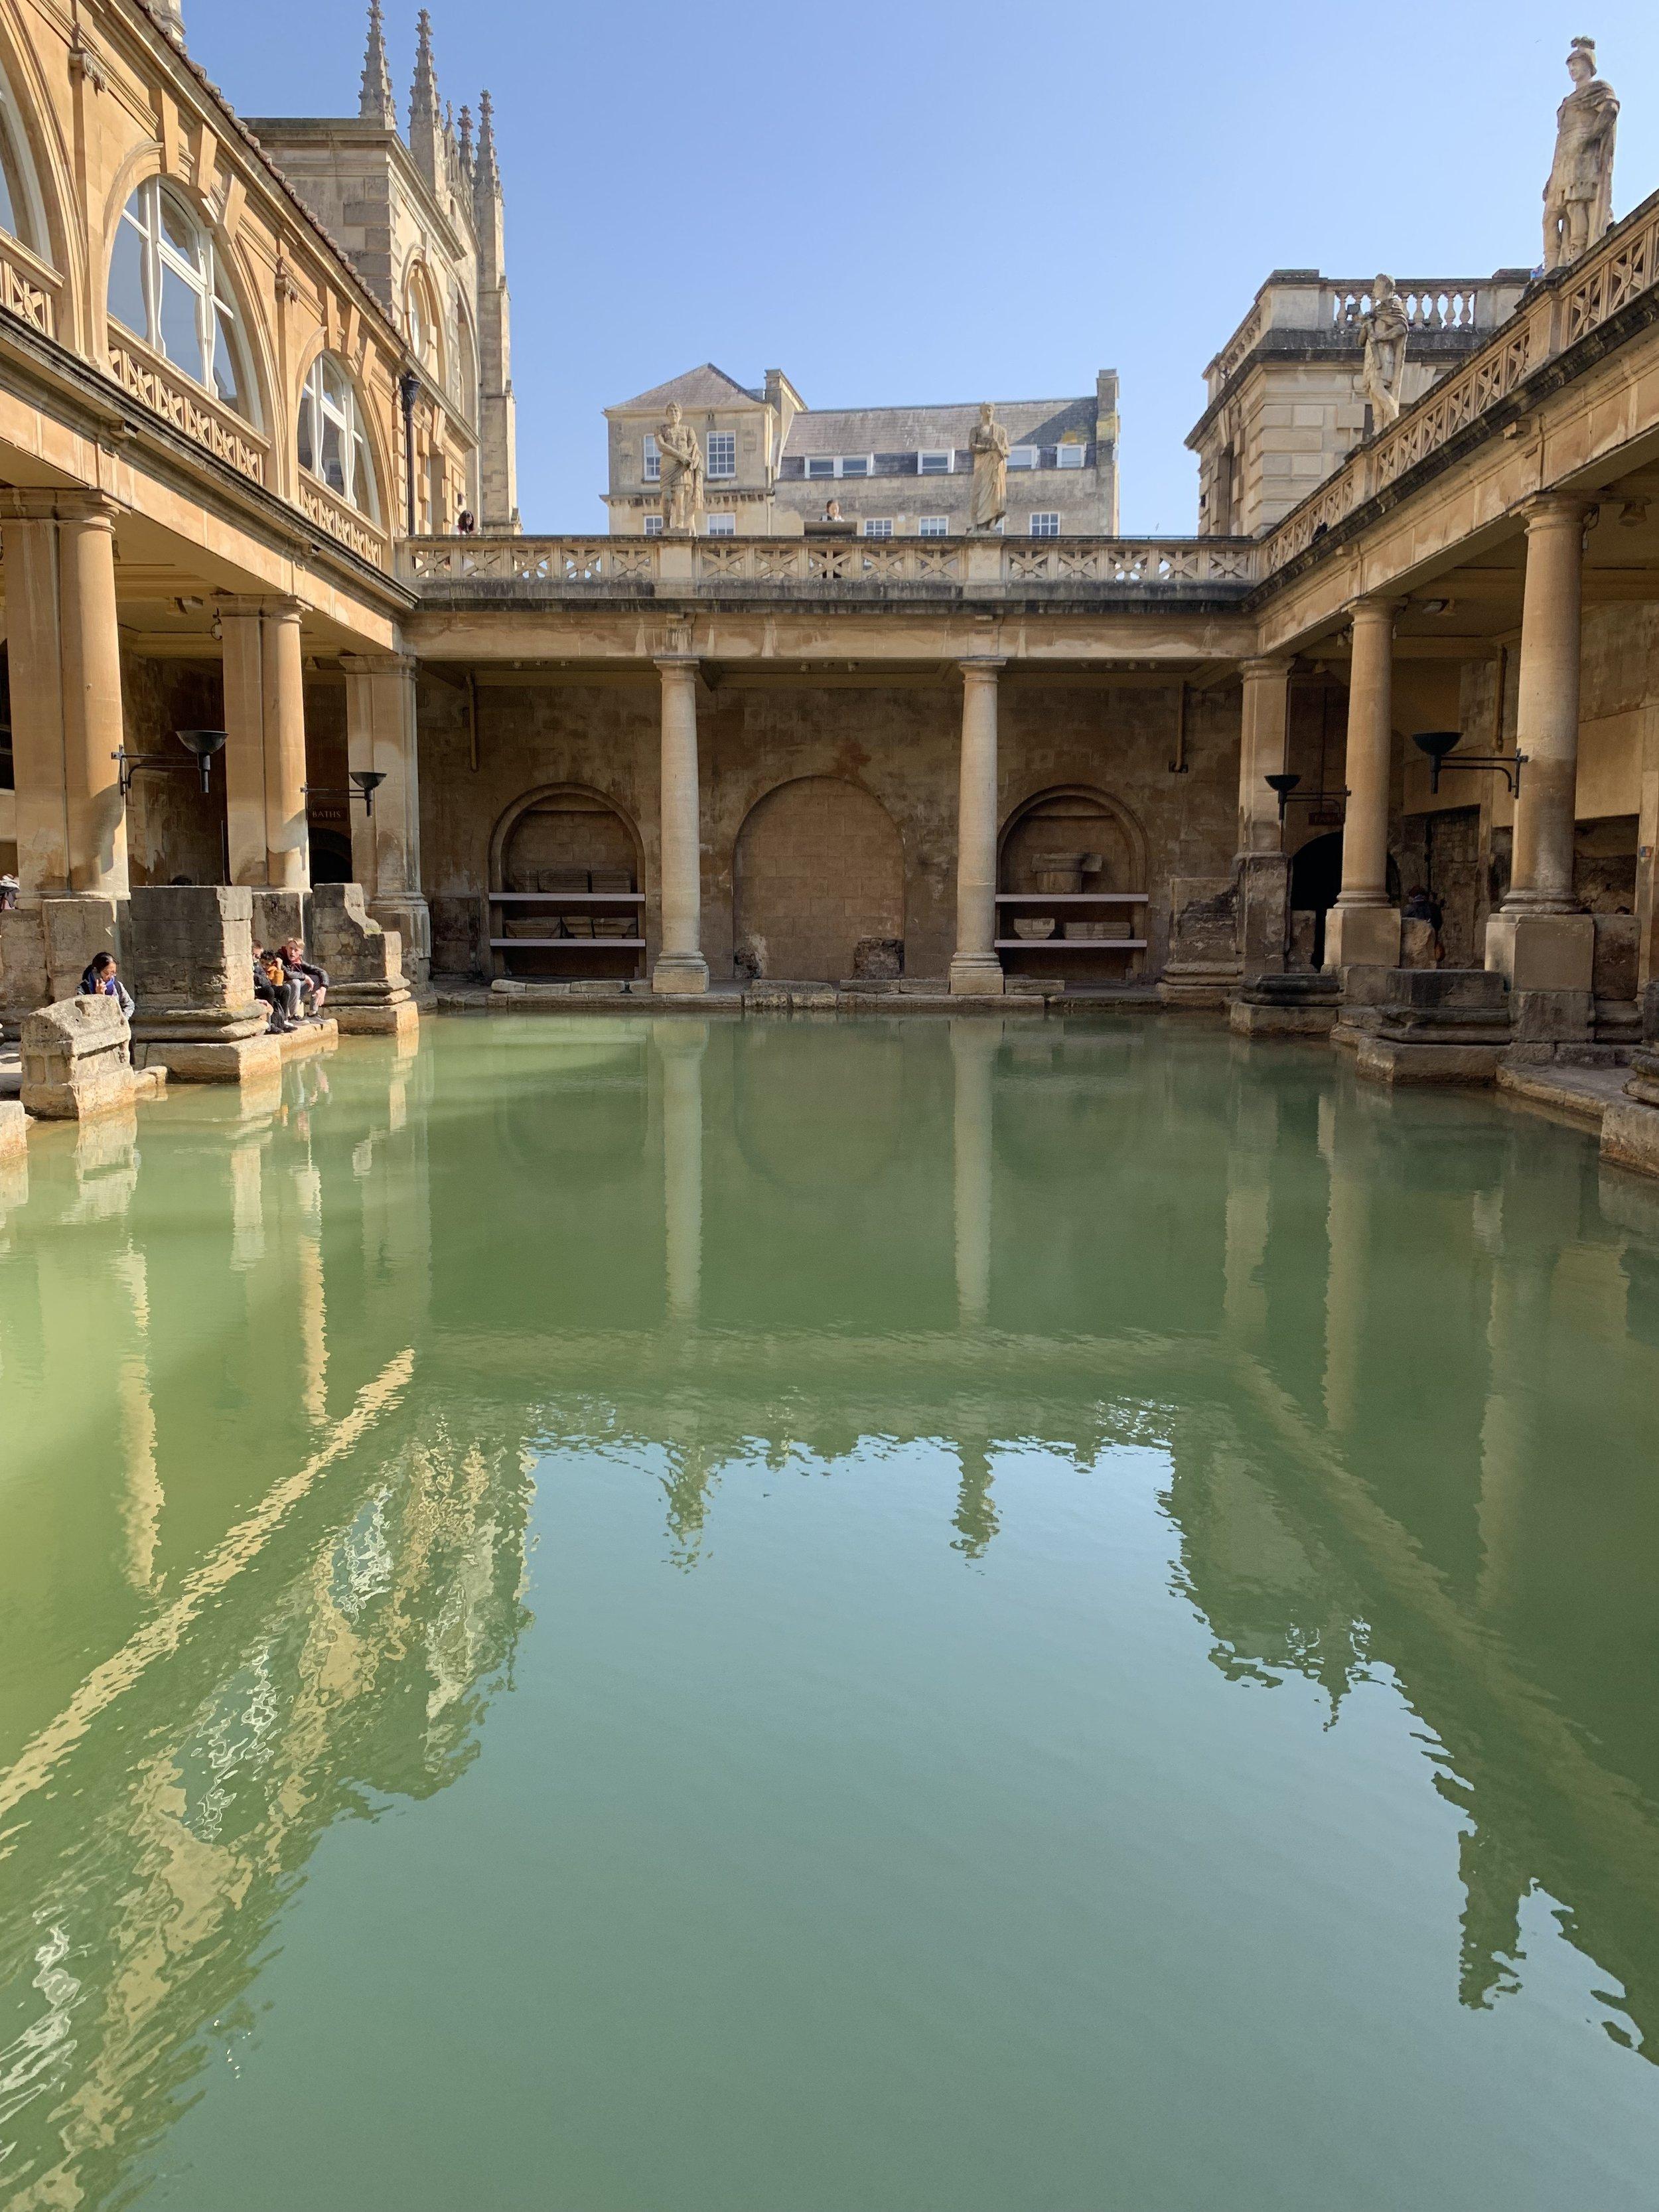 Midpoint of the Roman Baths